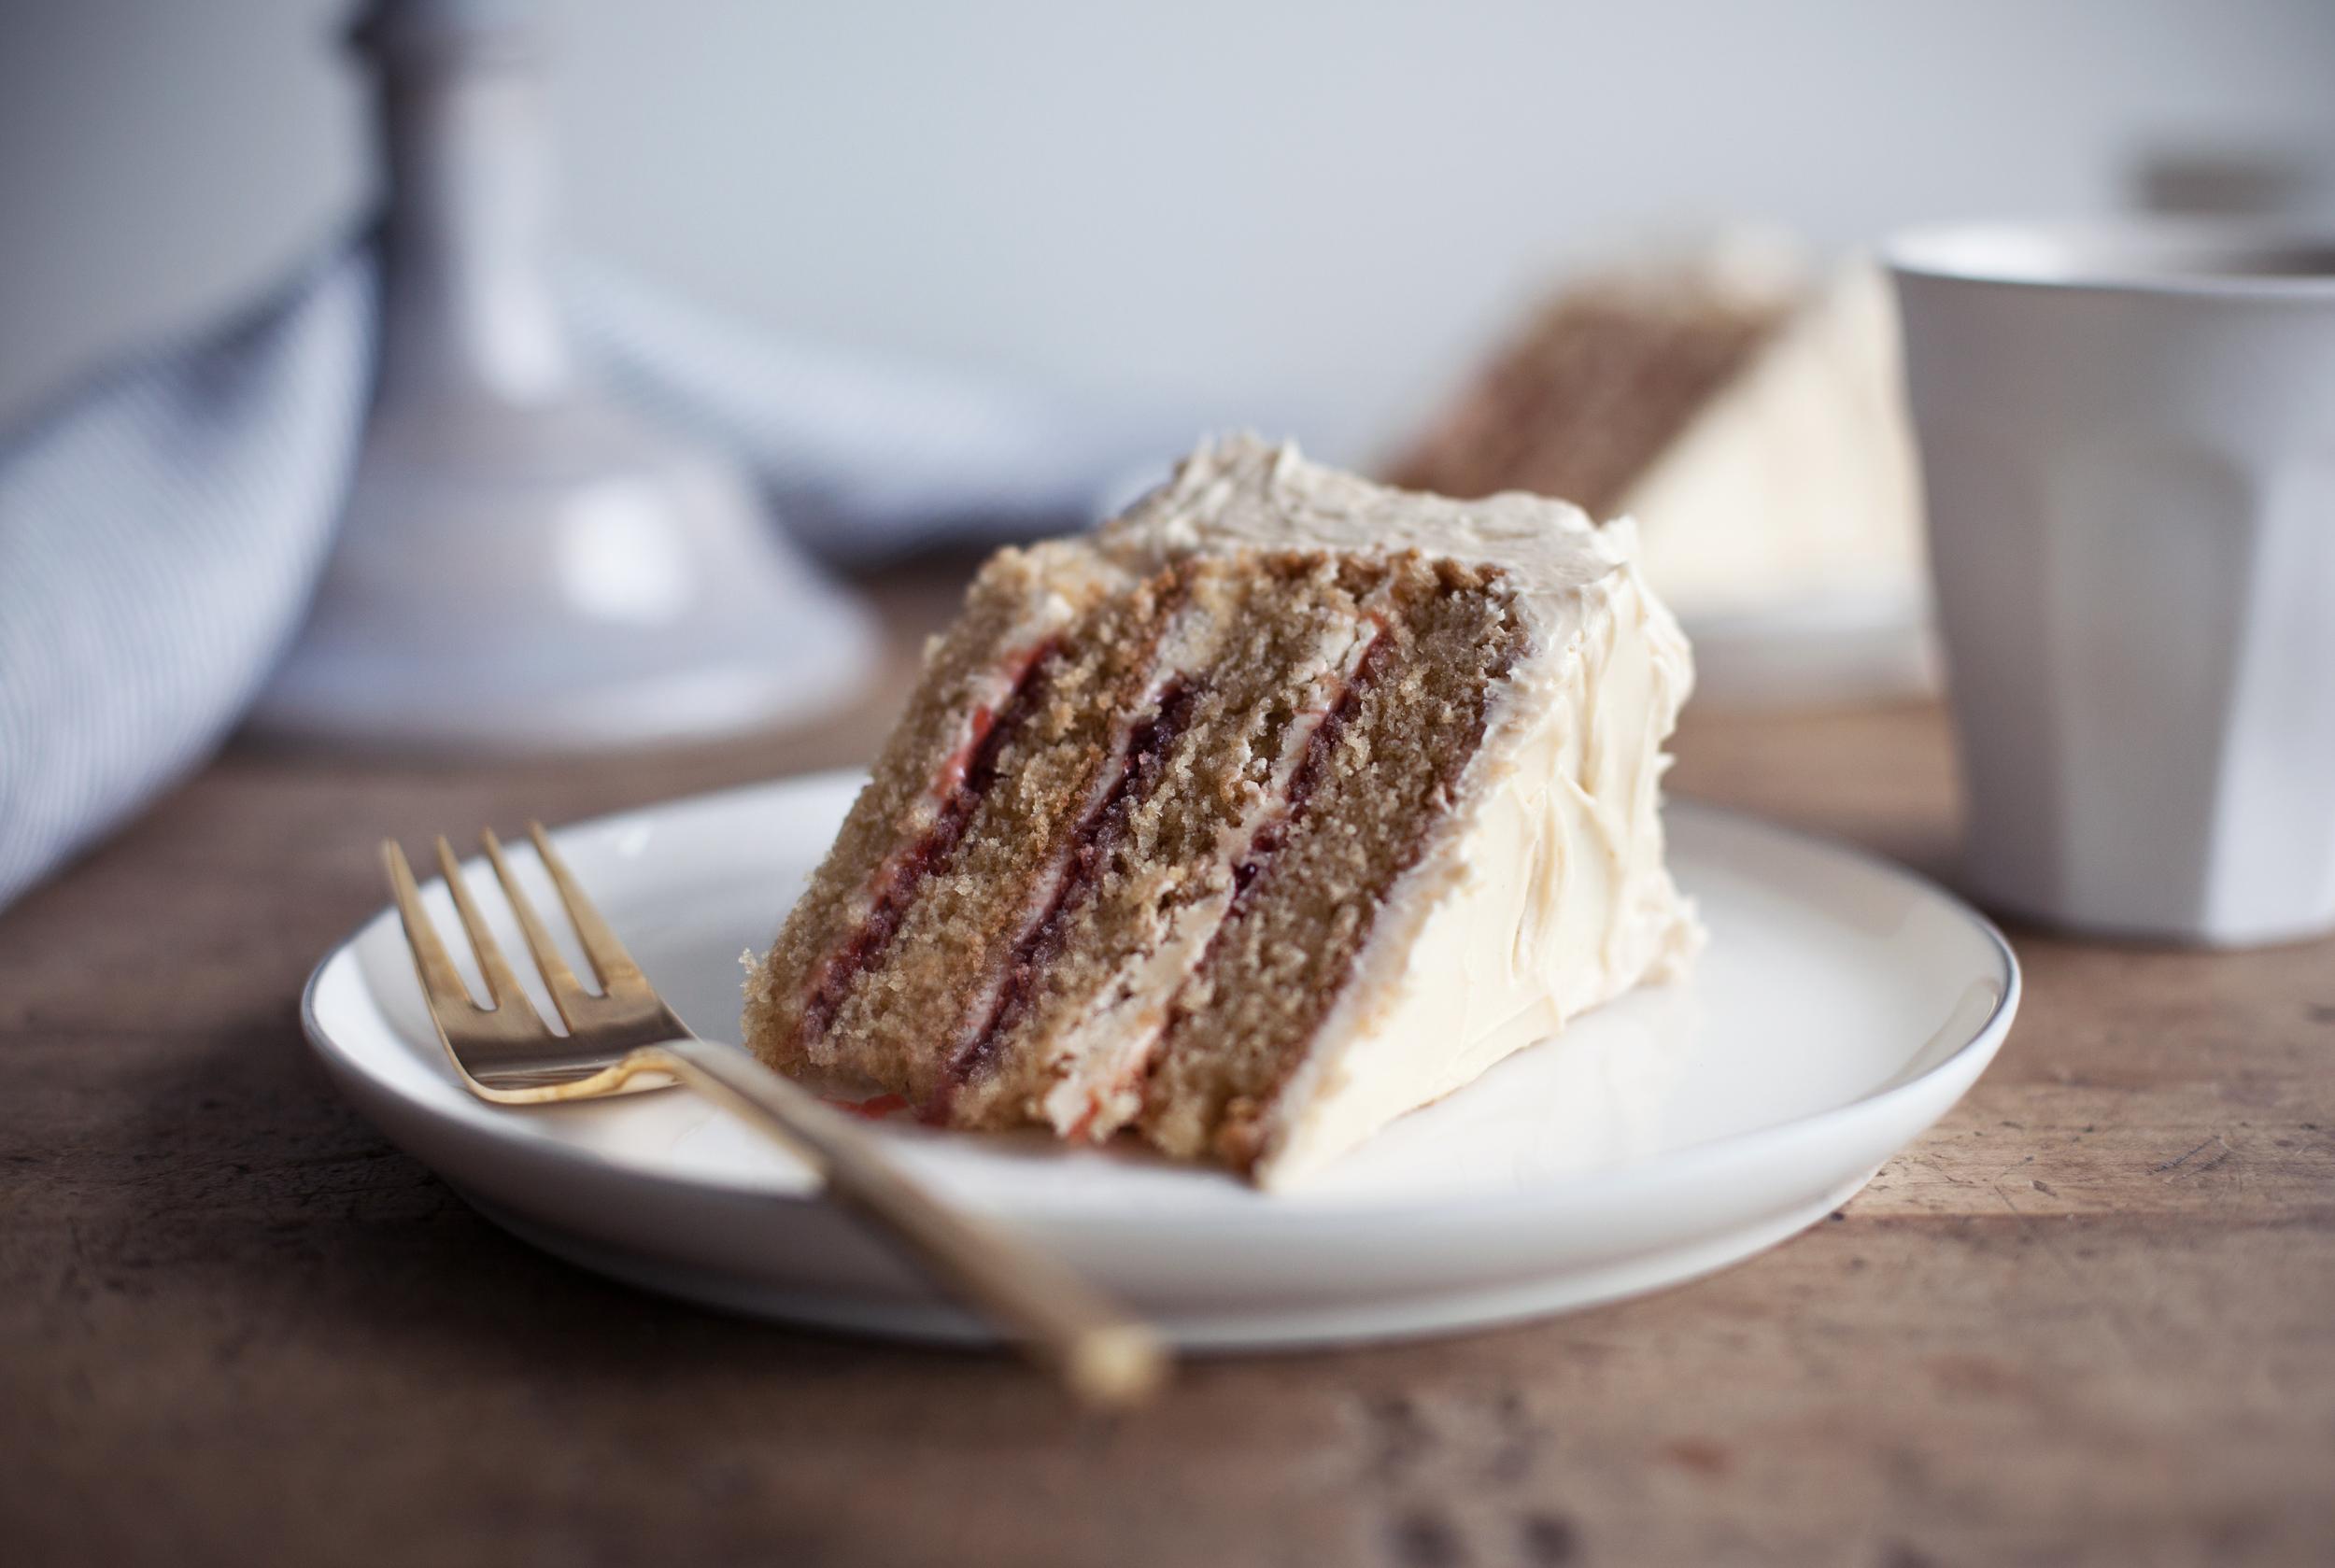 peanut butter & jelly cake vii.jpg